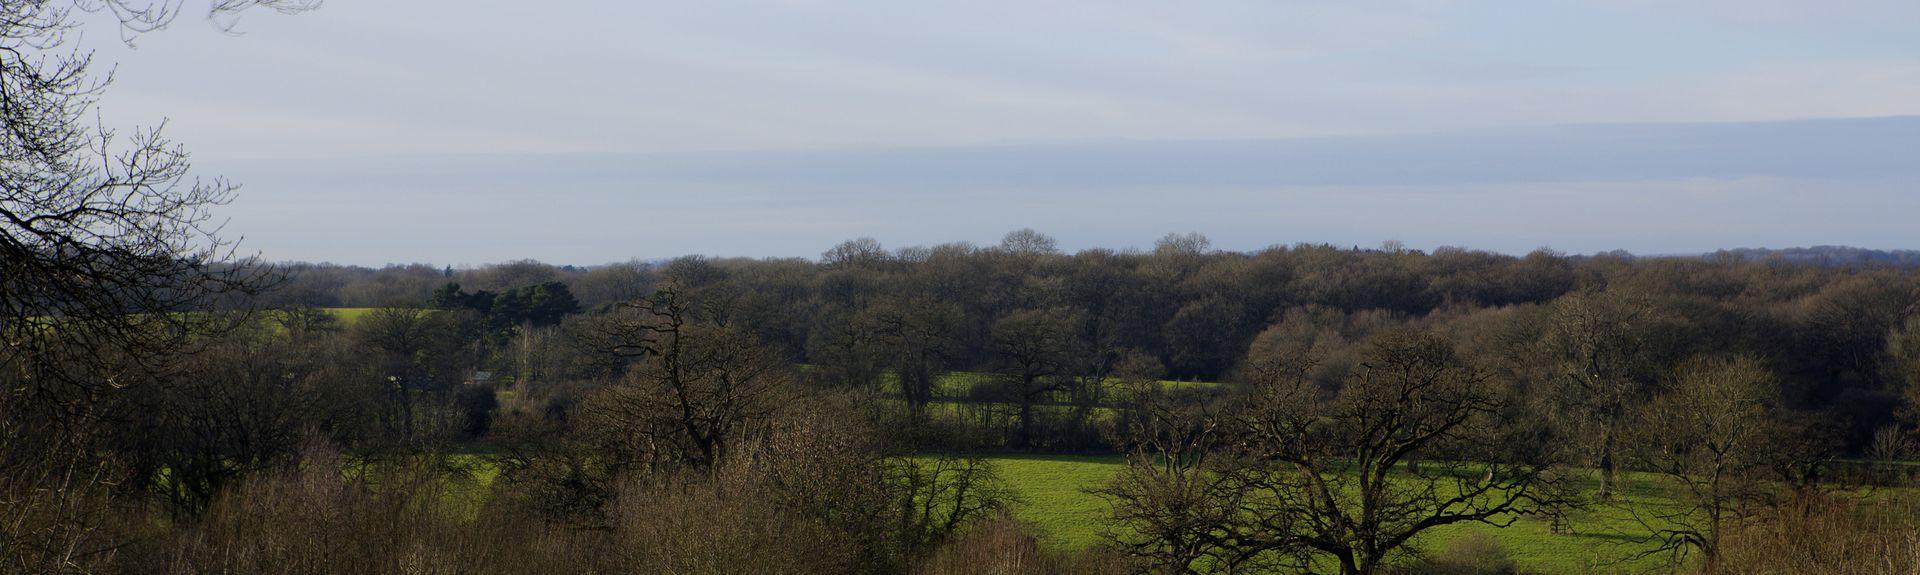 Whitchurch, Περιφέρεια Μπέιζινστοουκ εντ Ντιν, Αγγλία, Ηνωμένο Βασίλειο